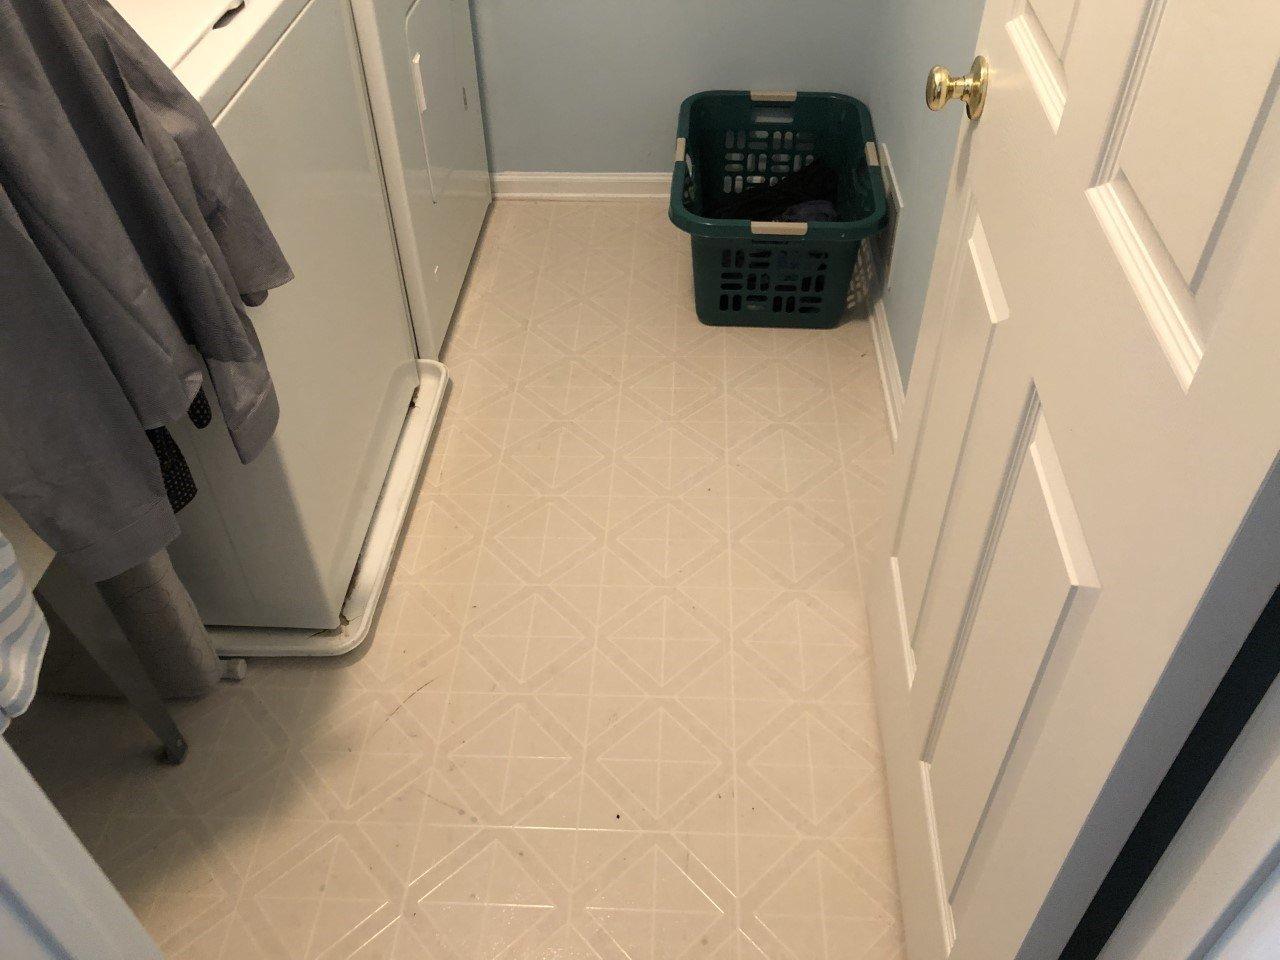 Basking Ridge Laundry Room Tile Renovation